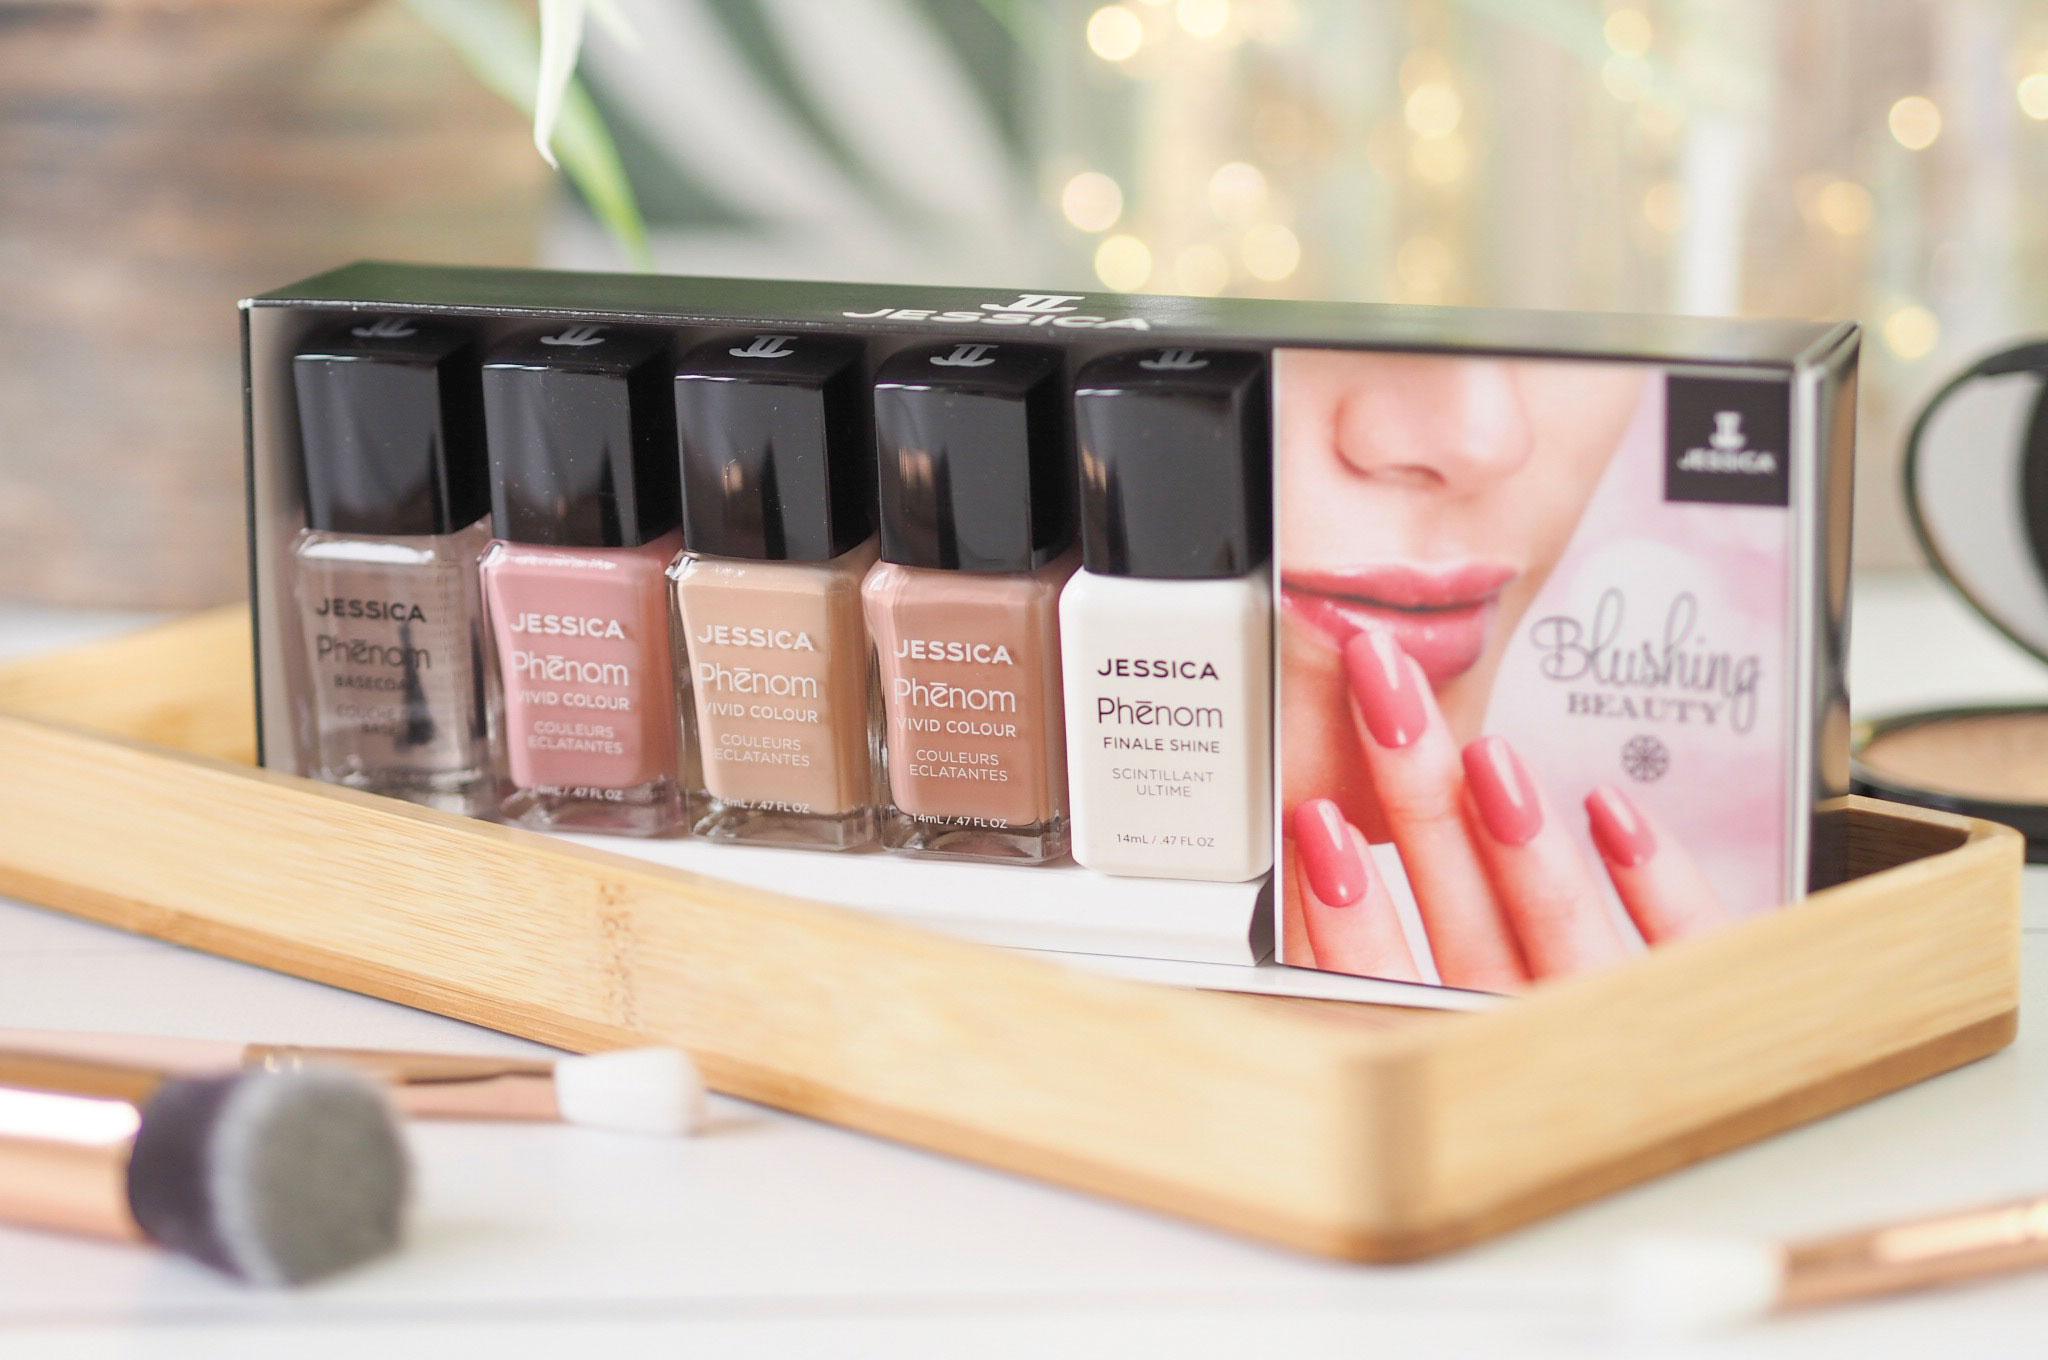 Jessica Phenom Blushing Beauty Nail Polish